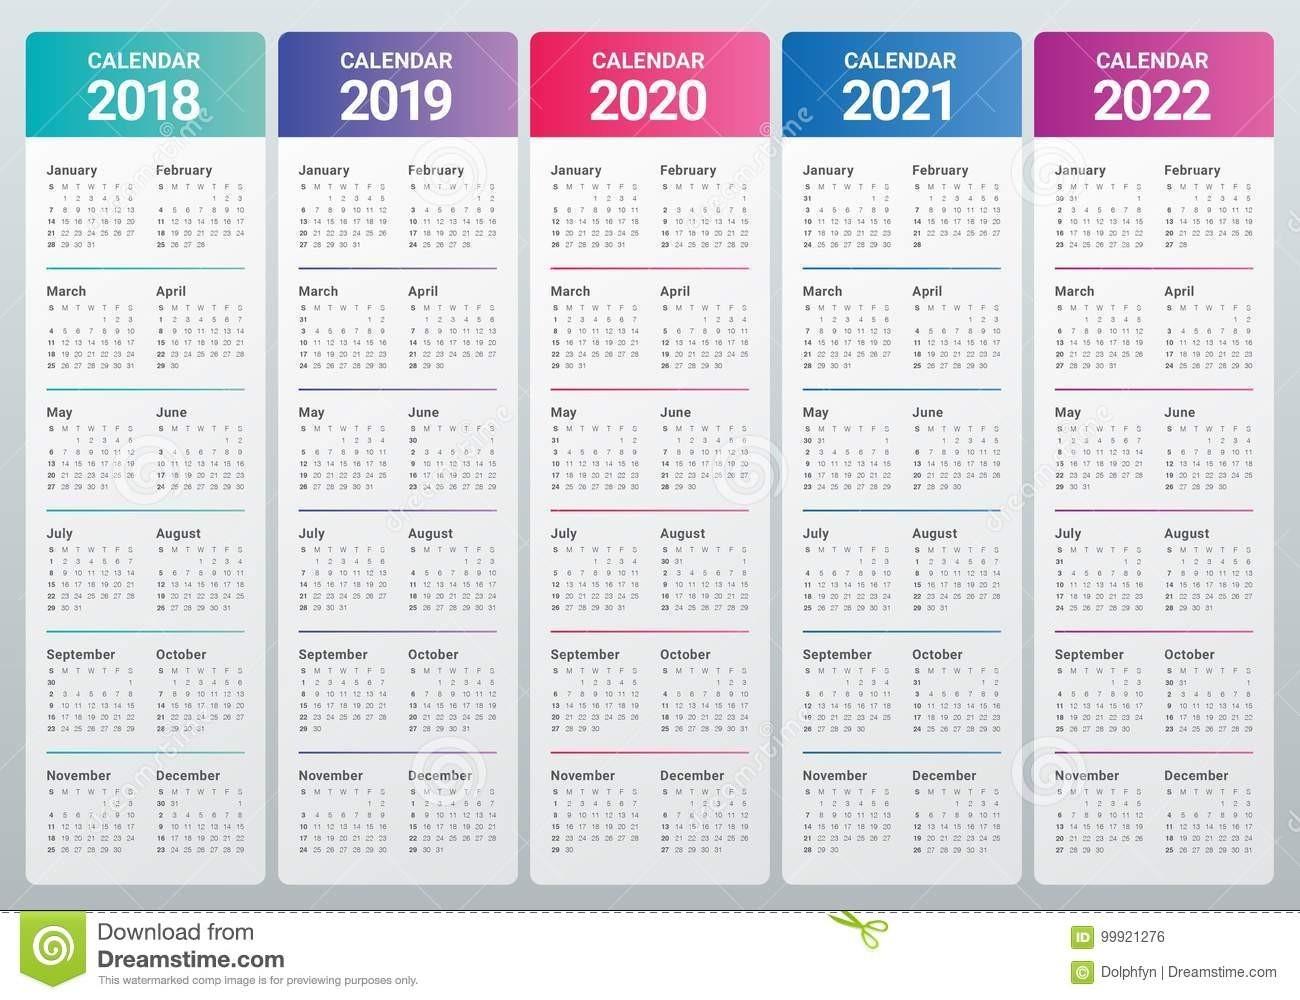 Year 2018 2019 2020 2021 2022 Calendar Vector Stock Vector - Illustration Of 2022, 2020: 99921276-3 Year Calendar 2021